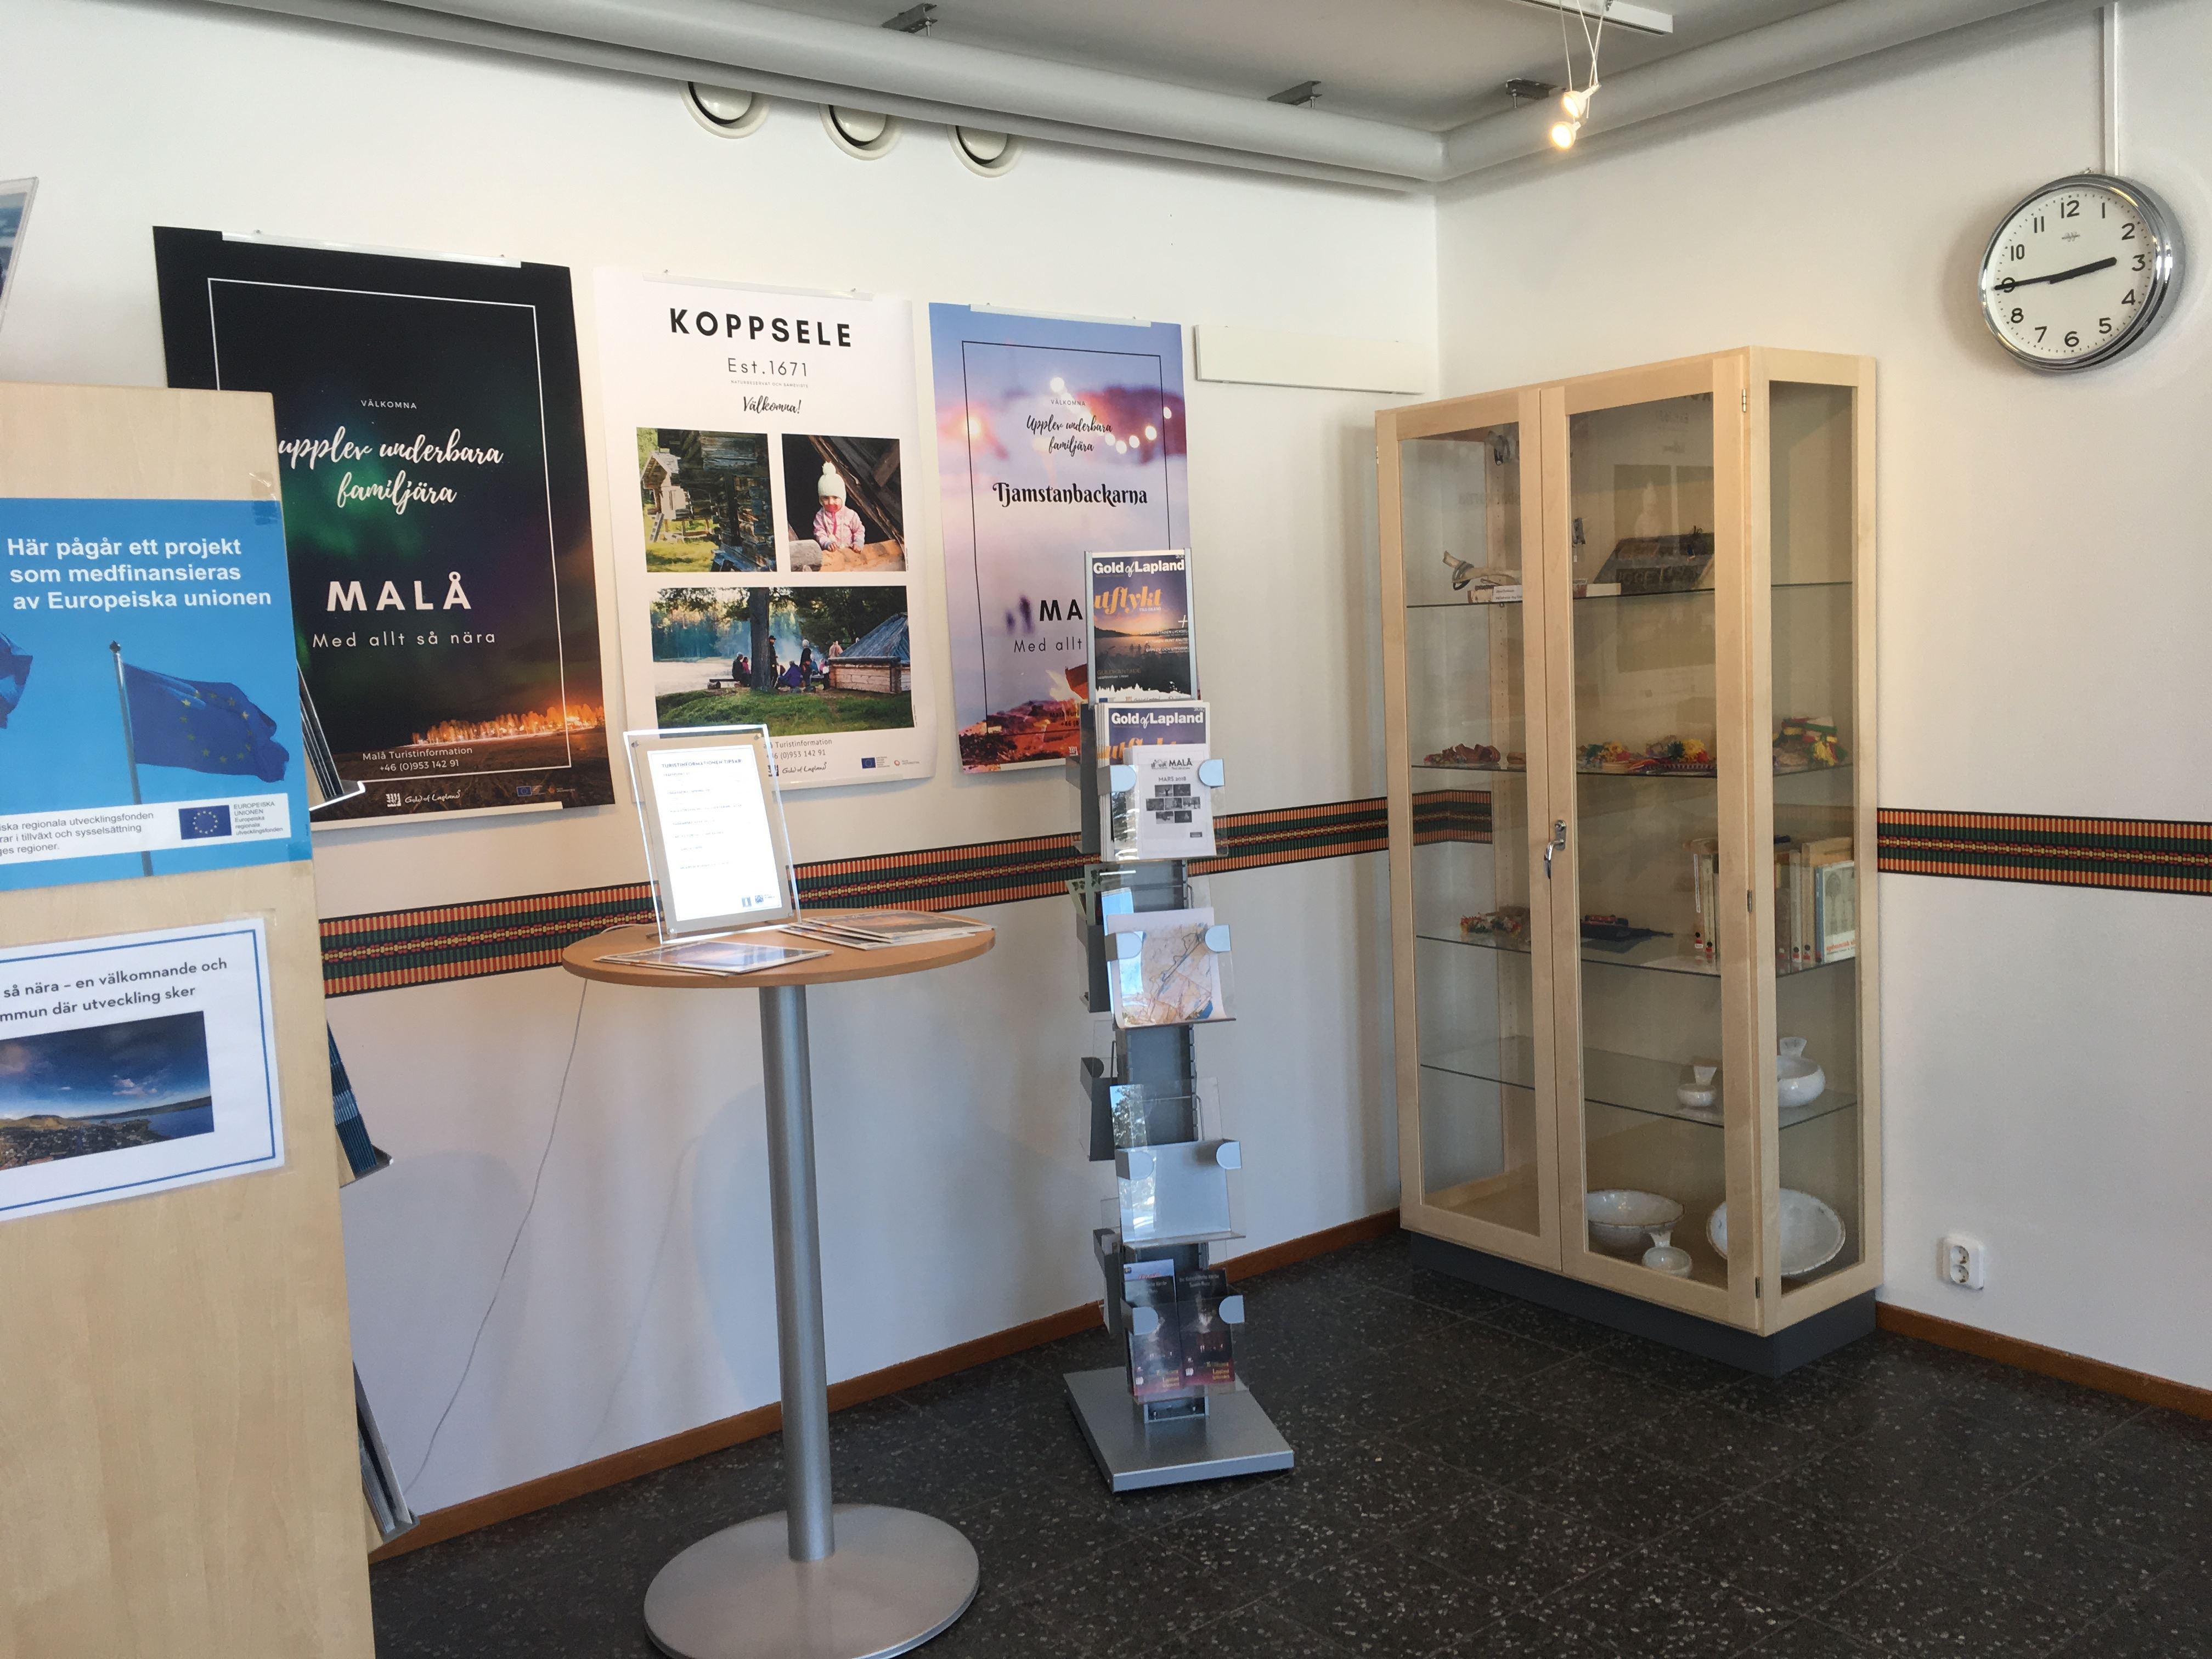 Invigning Malå turistinformation lokal prägel